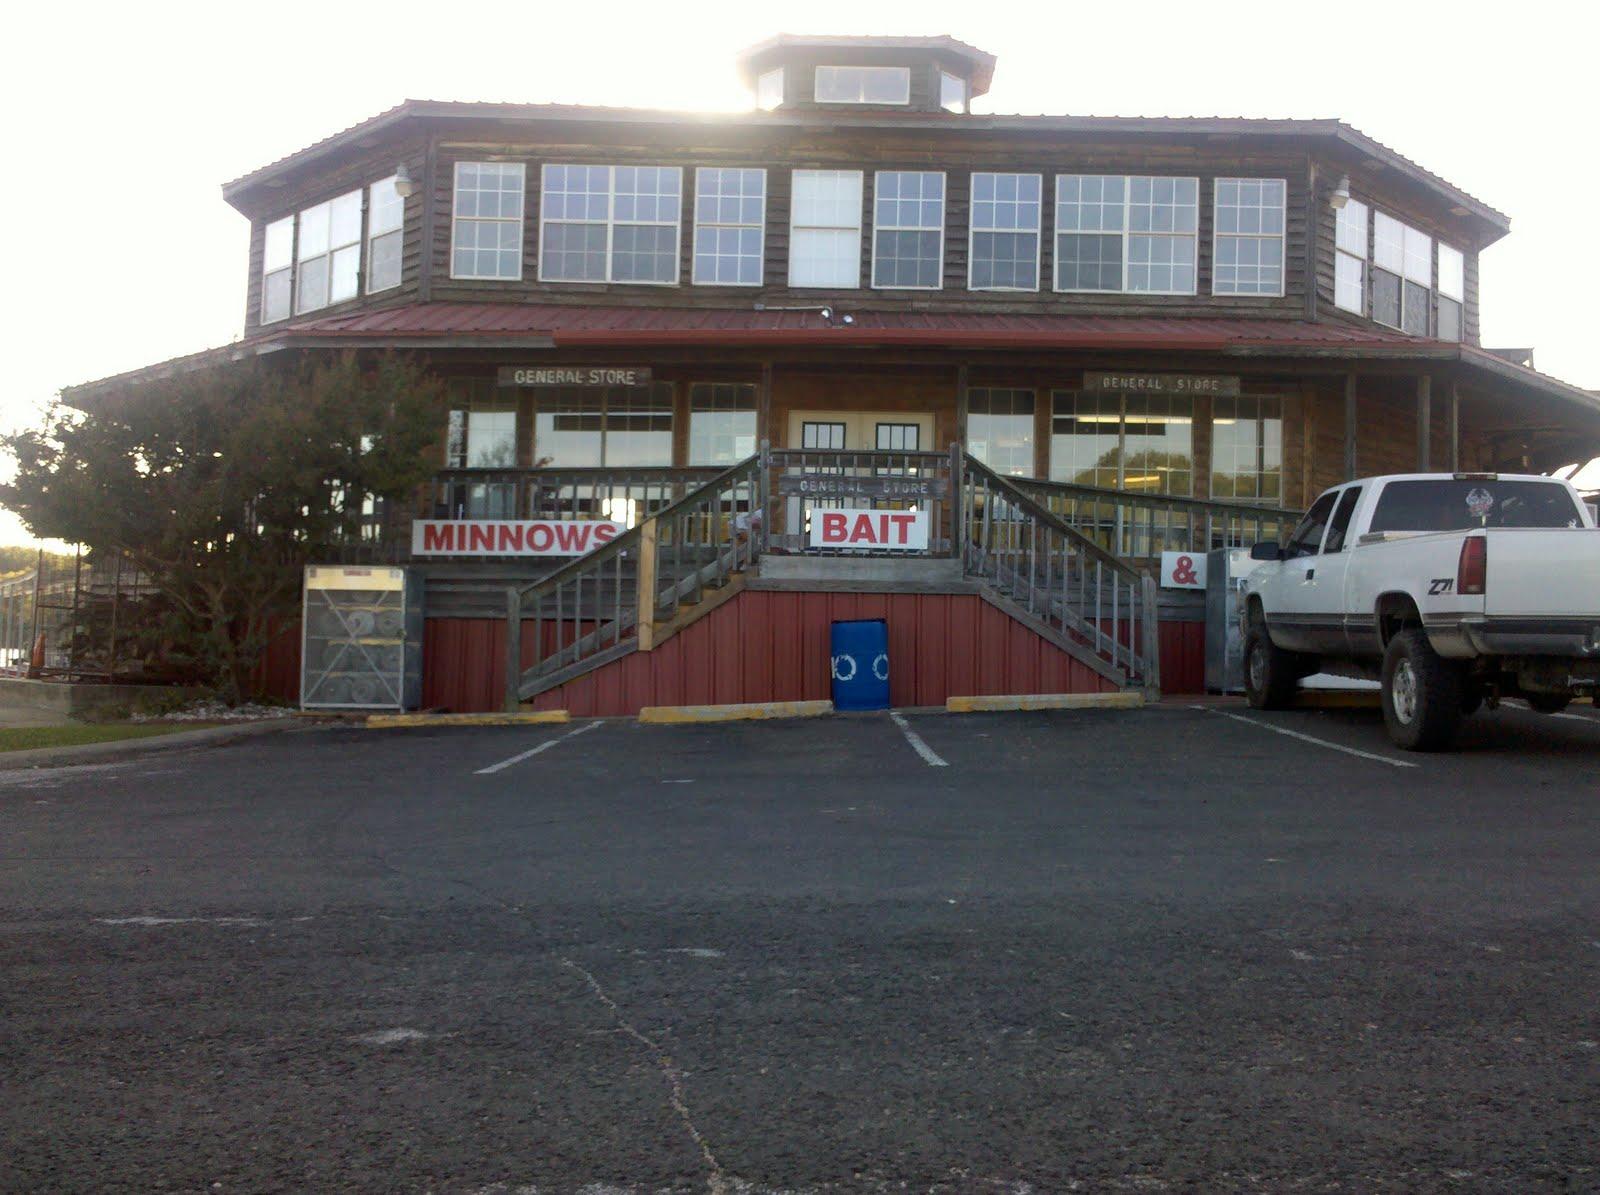 Campsite Lake Historical Site Reviews Texas Cedar Hill State Park Revisted